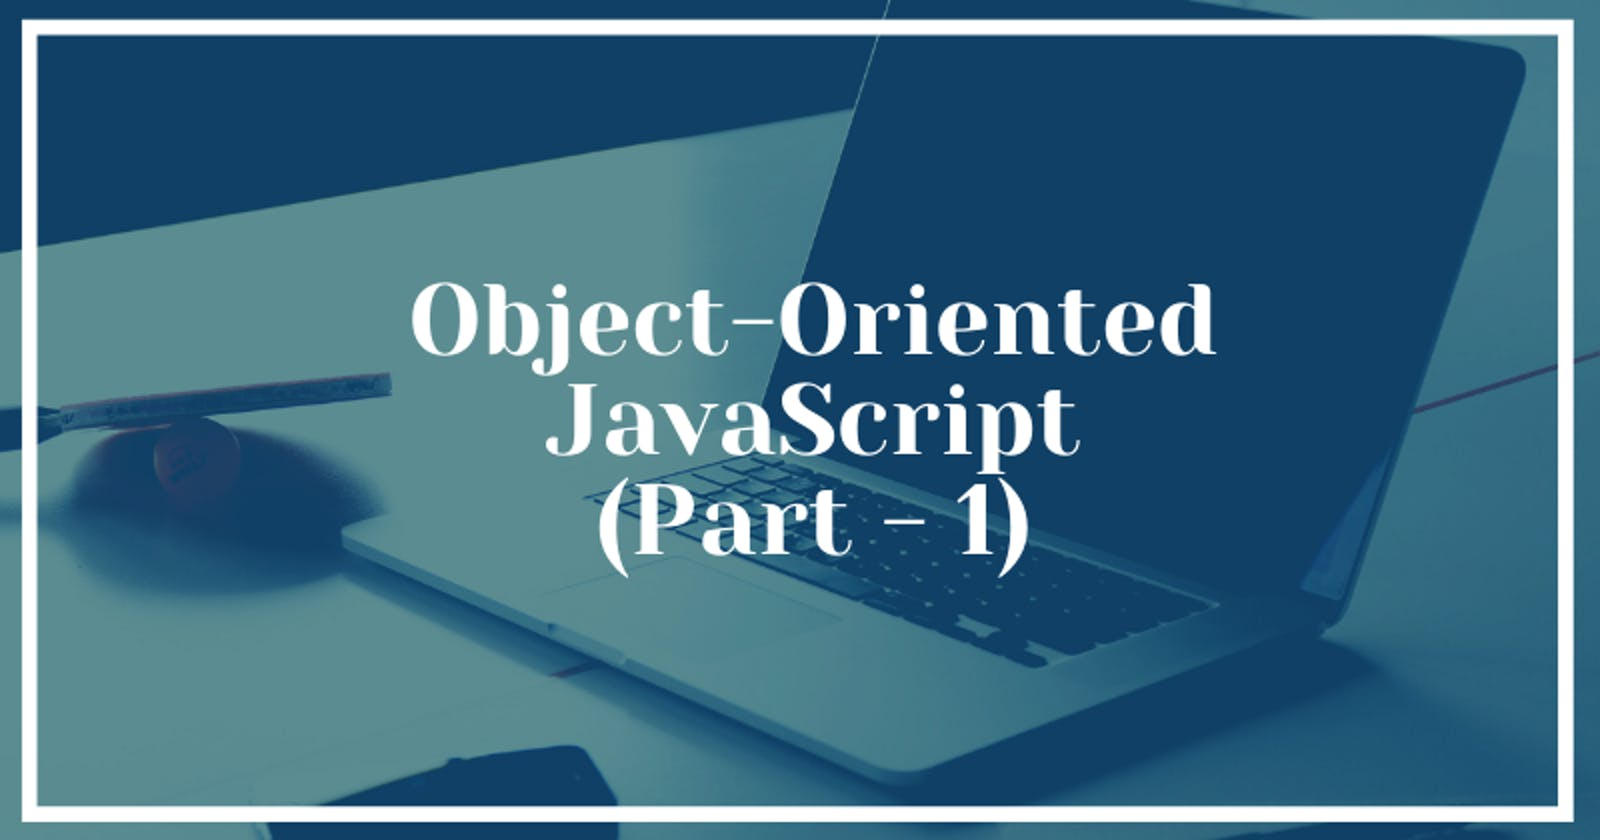 Object-Oriented JavaScript (Part - 1)